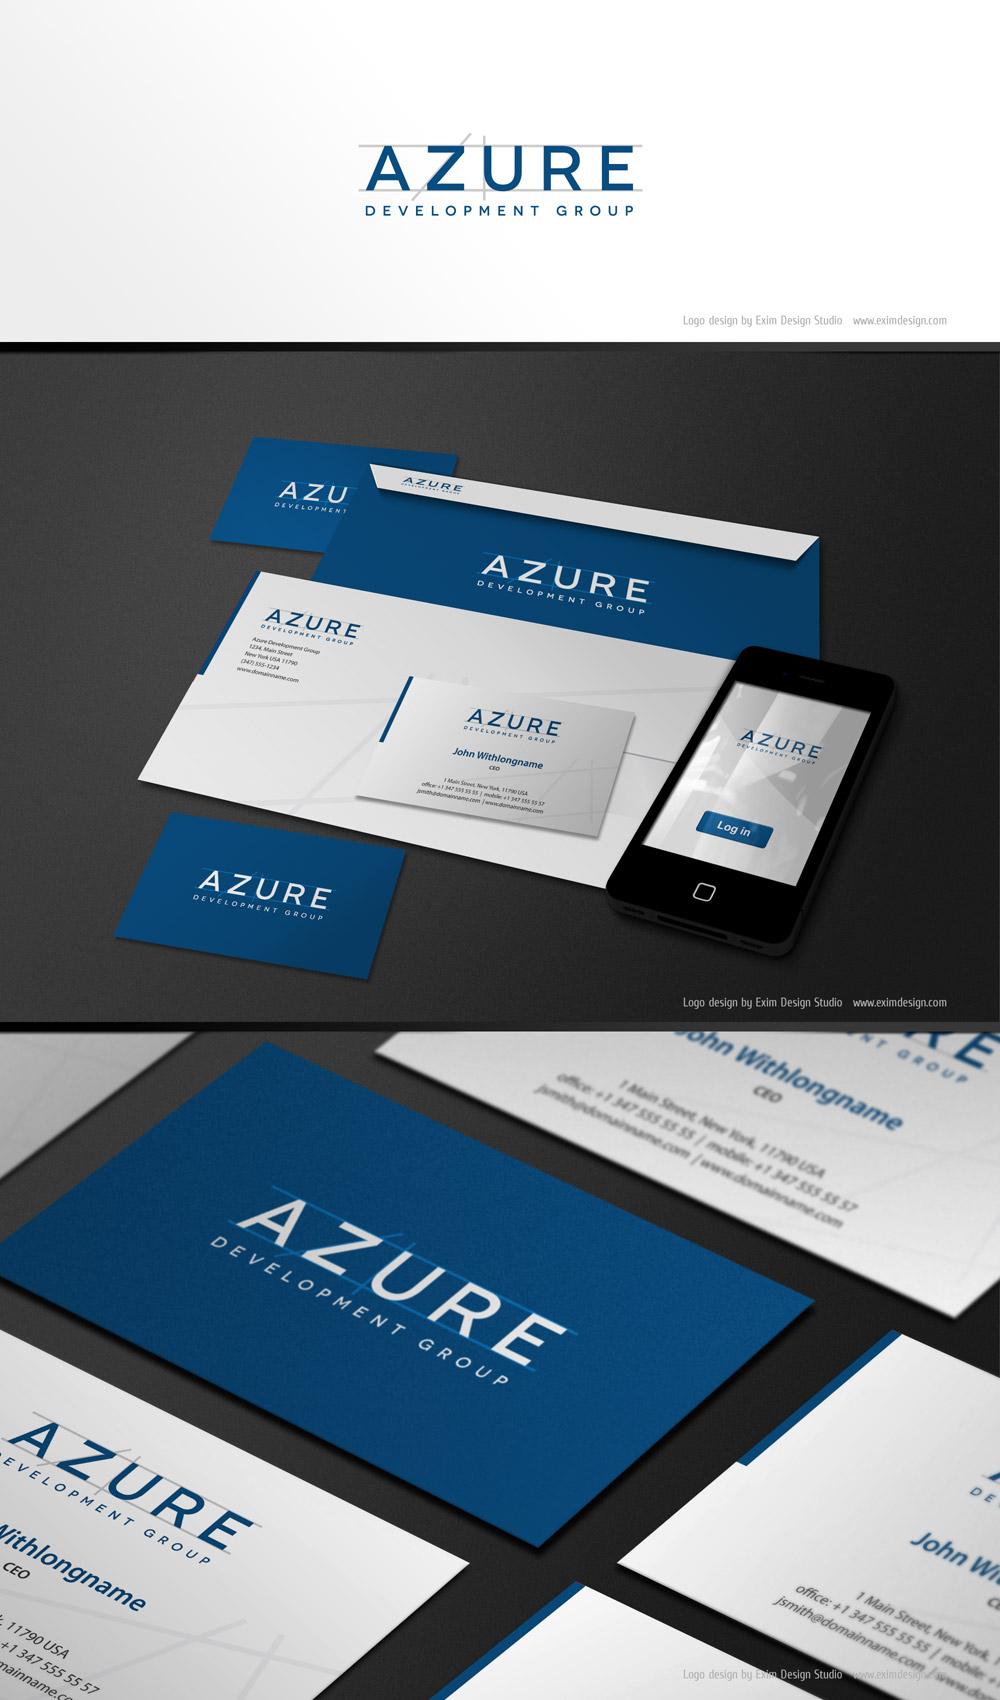 eximdesign_azure_1.jpg